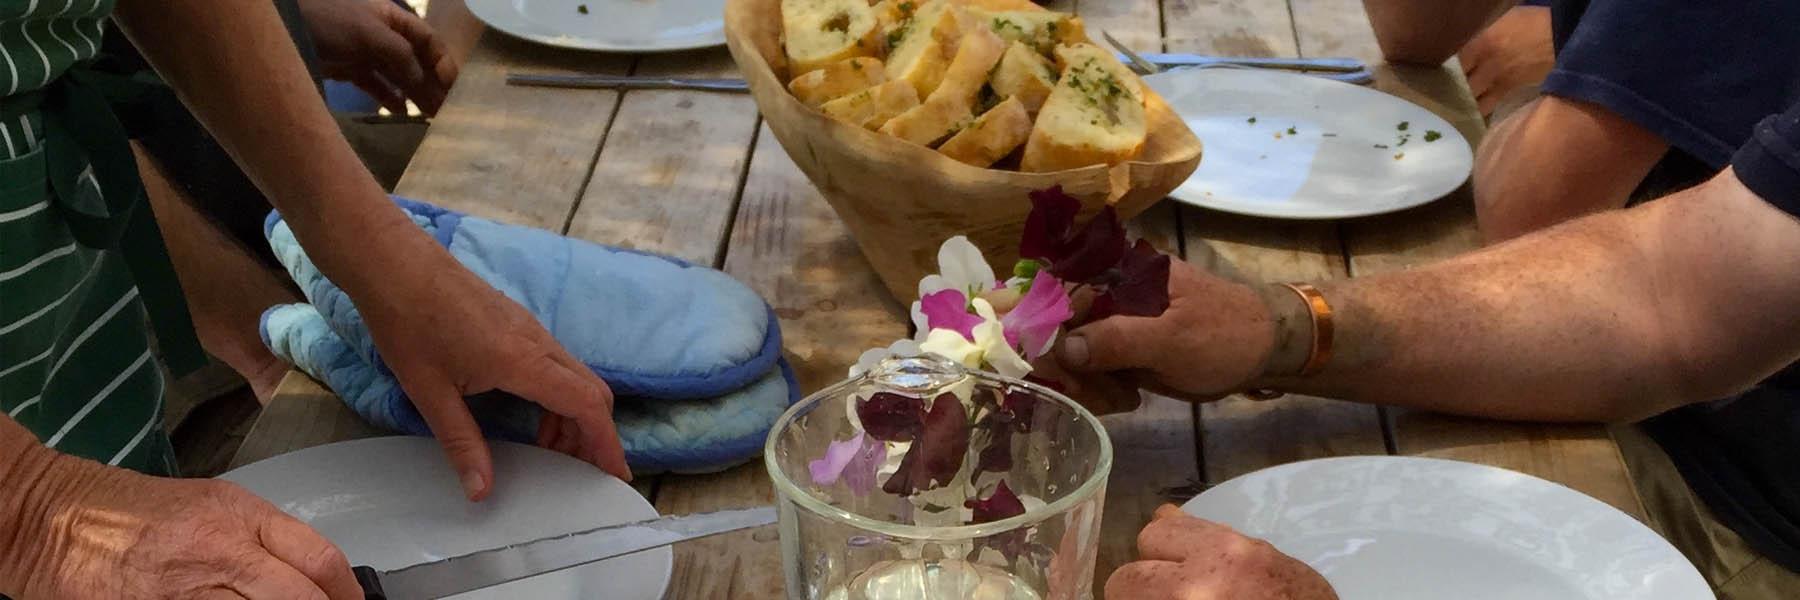 landworks lunch with garlic bread